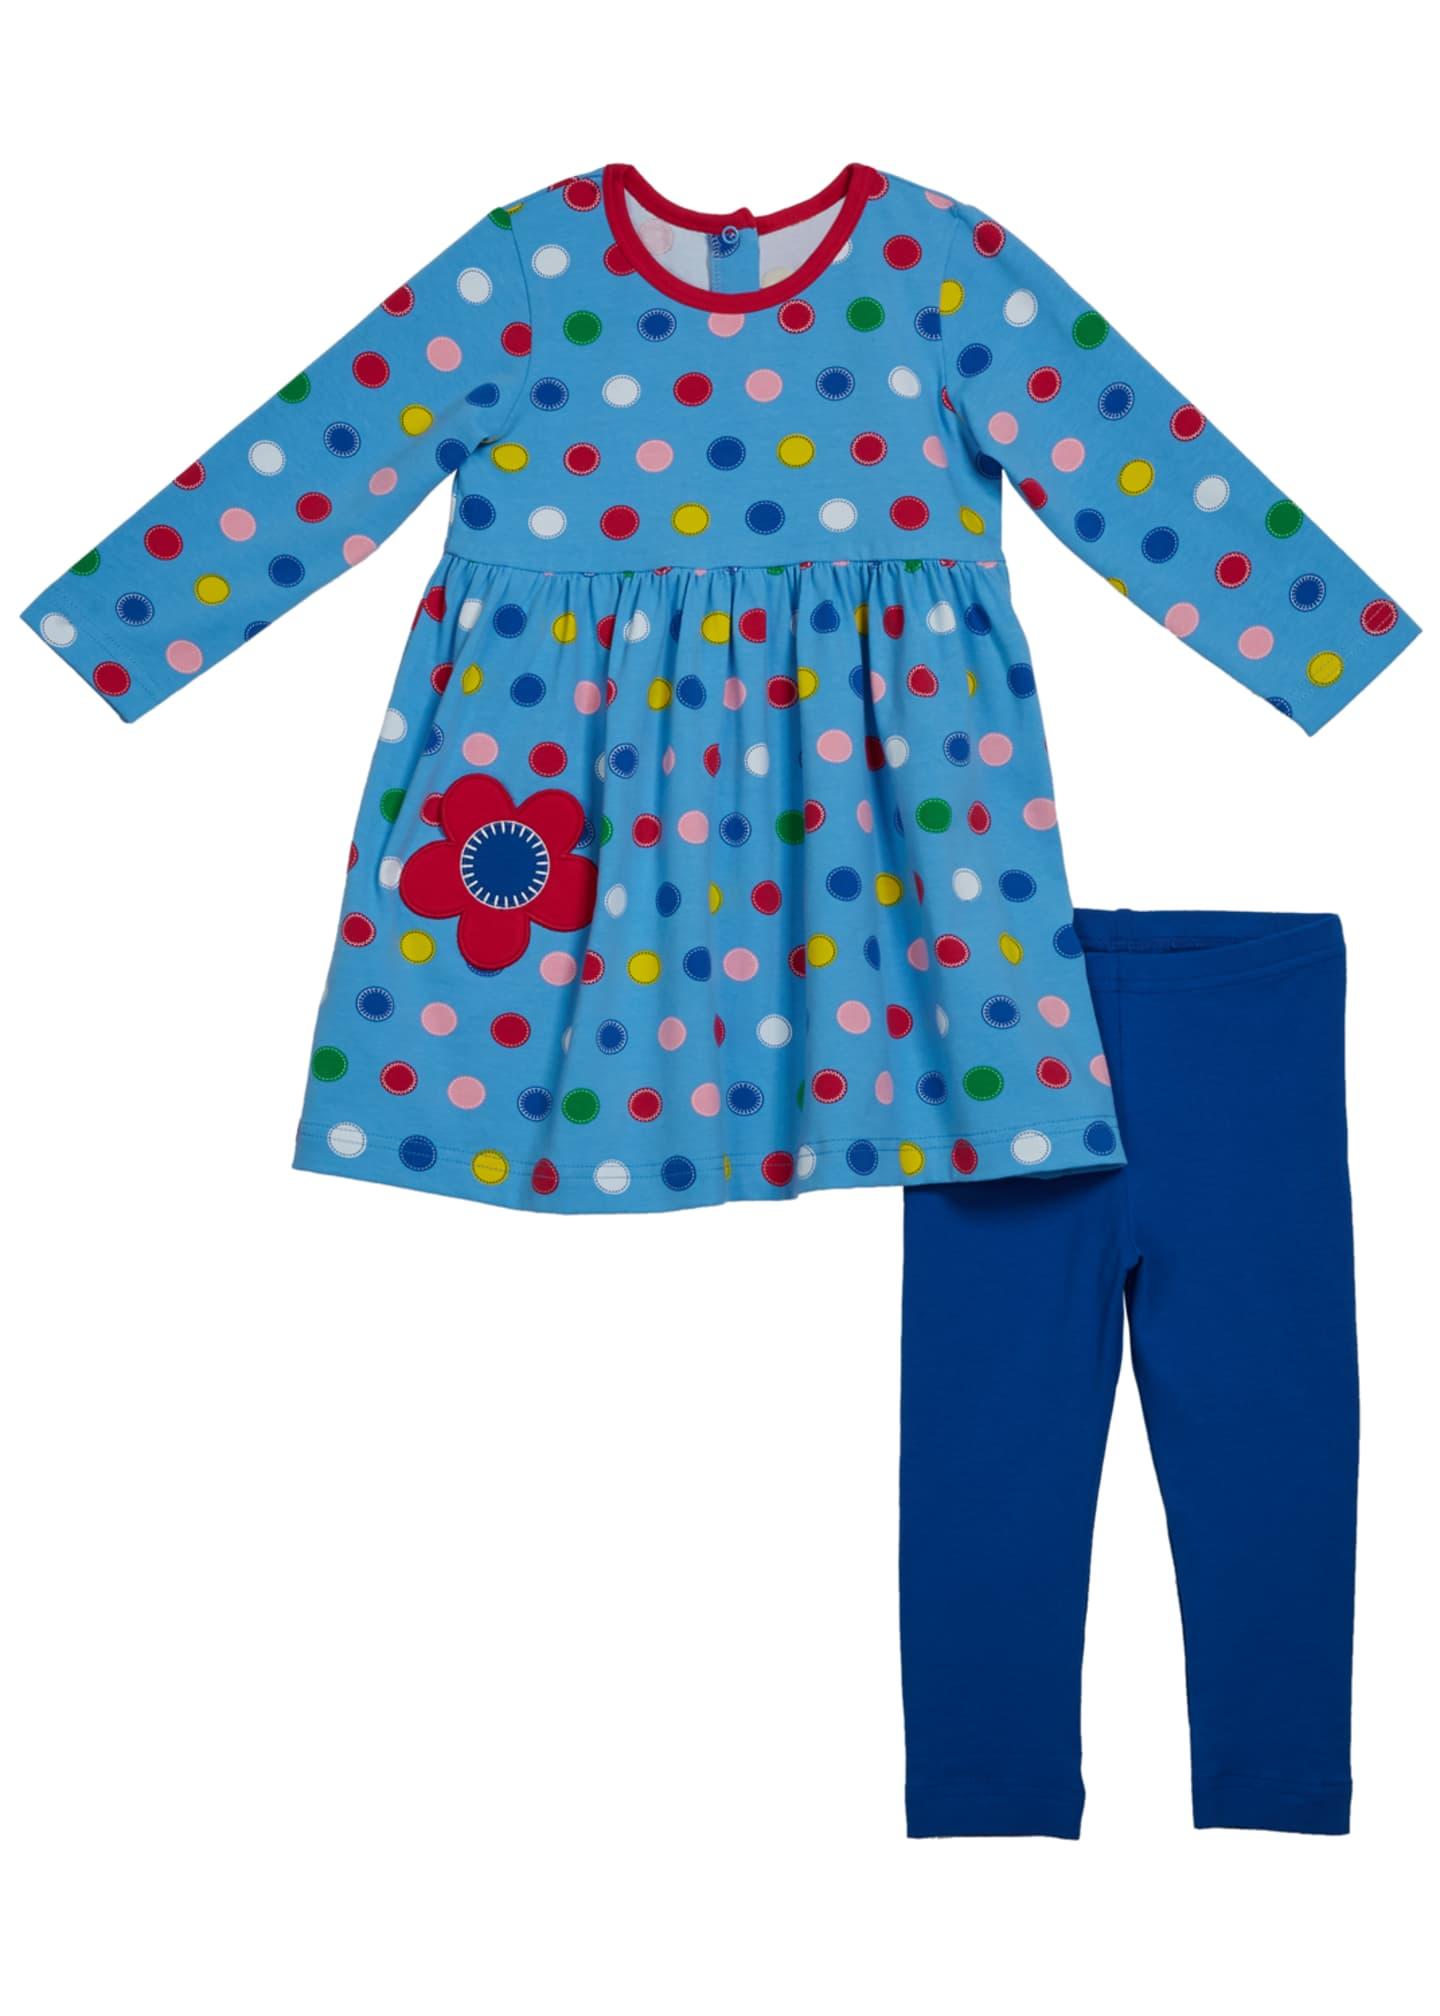 Florence Eiseman Girl's Multicolored Dot Print Dress w/